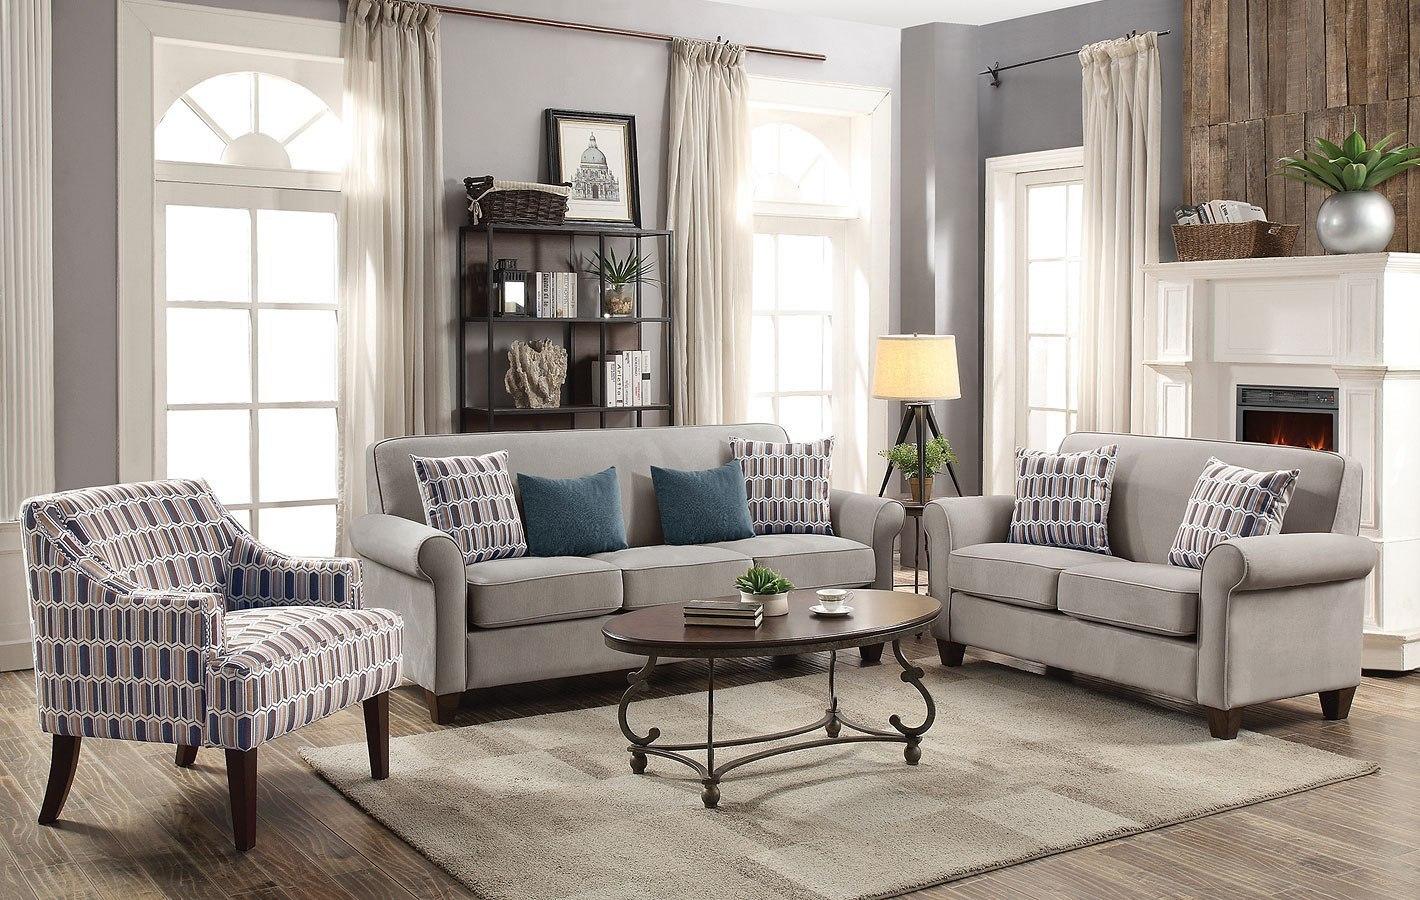 Gideon living room set cement coaster furniture furniture cart